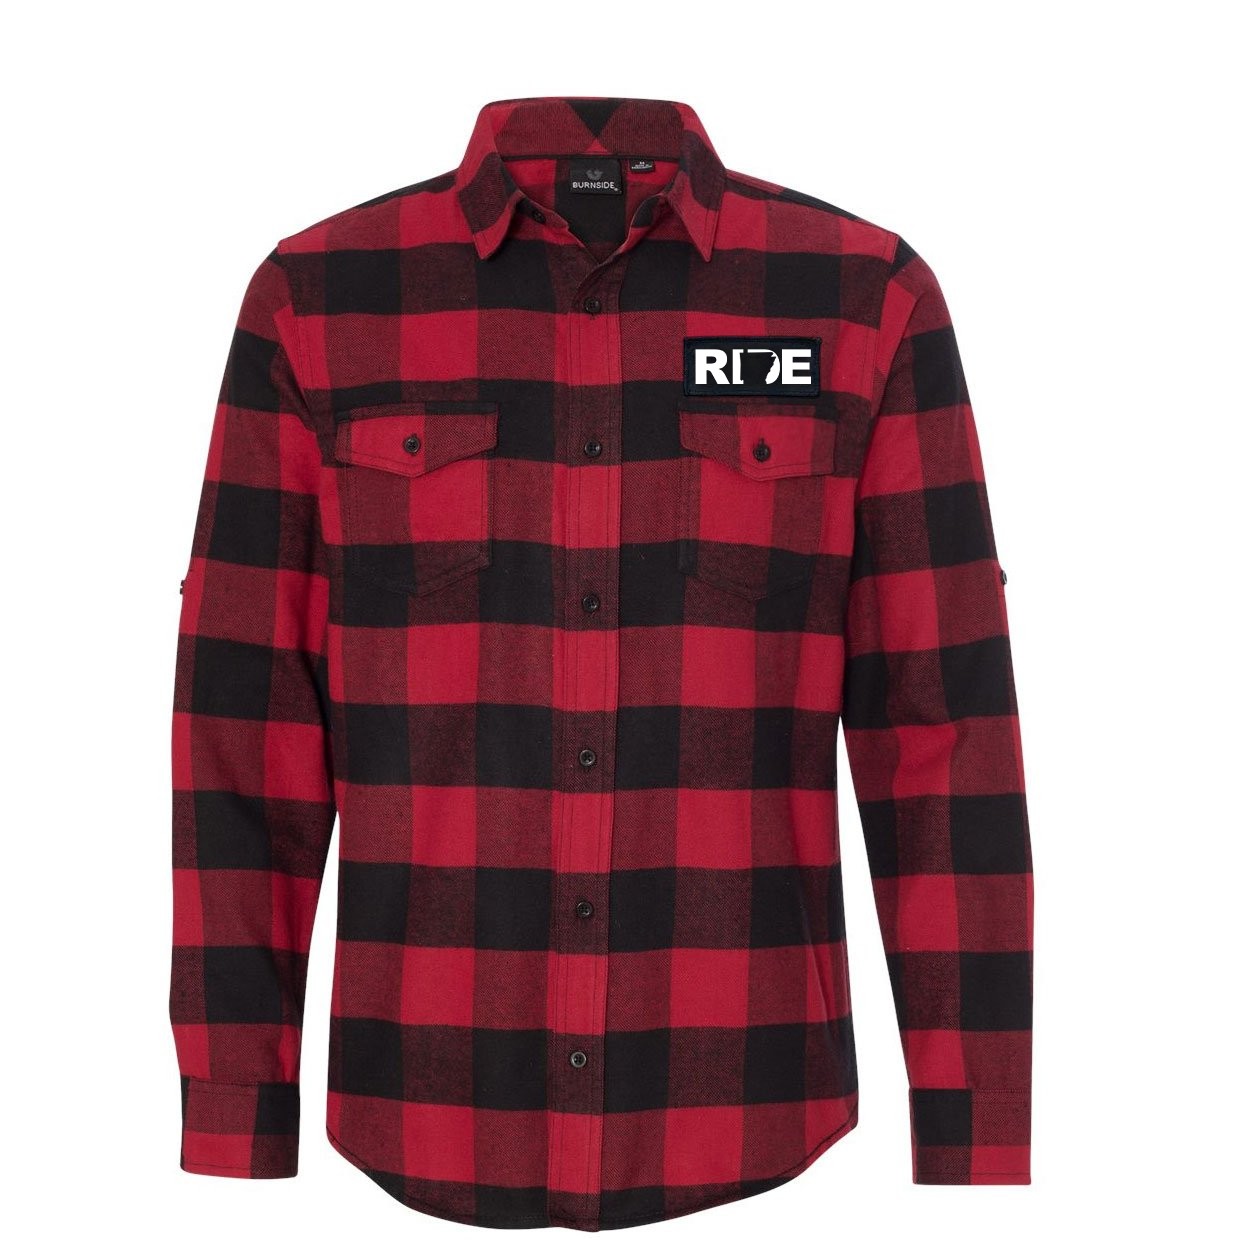 Ride Arkansas Classic Unisex Long Sleeve Woven Patch Flannel Shirt Red/Black Buffalo (White Logo)